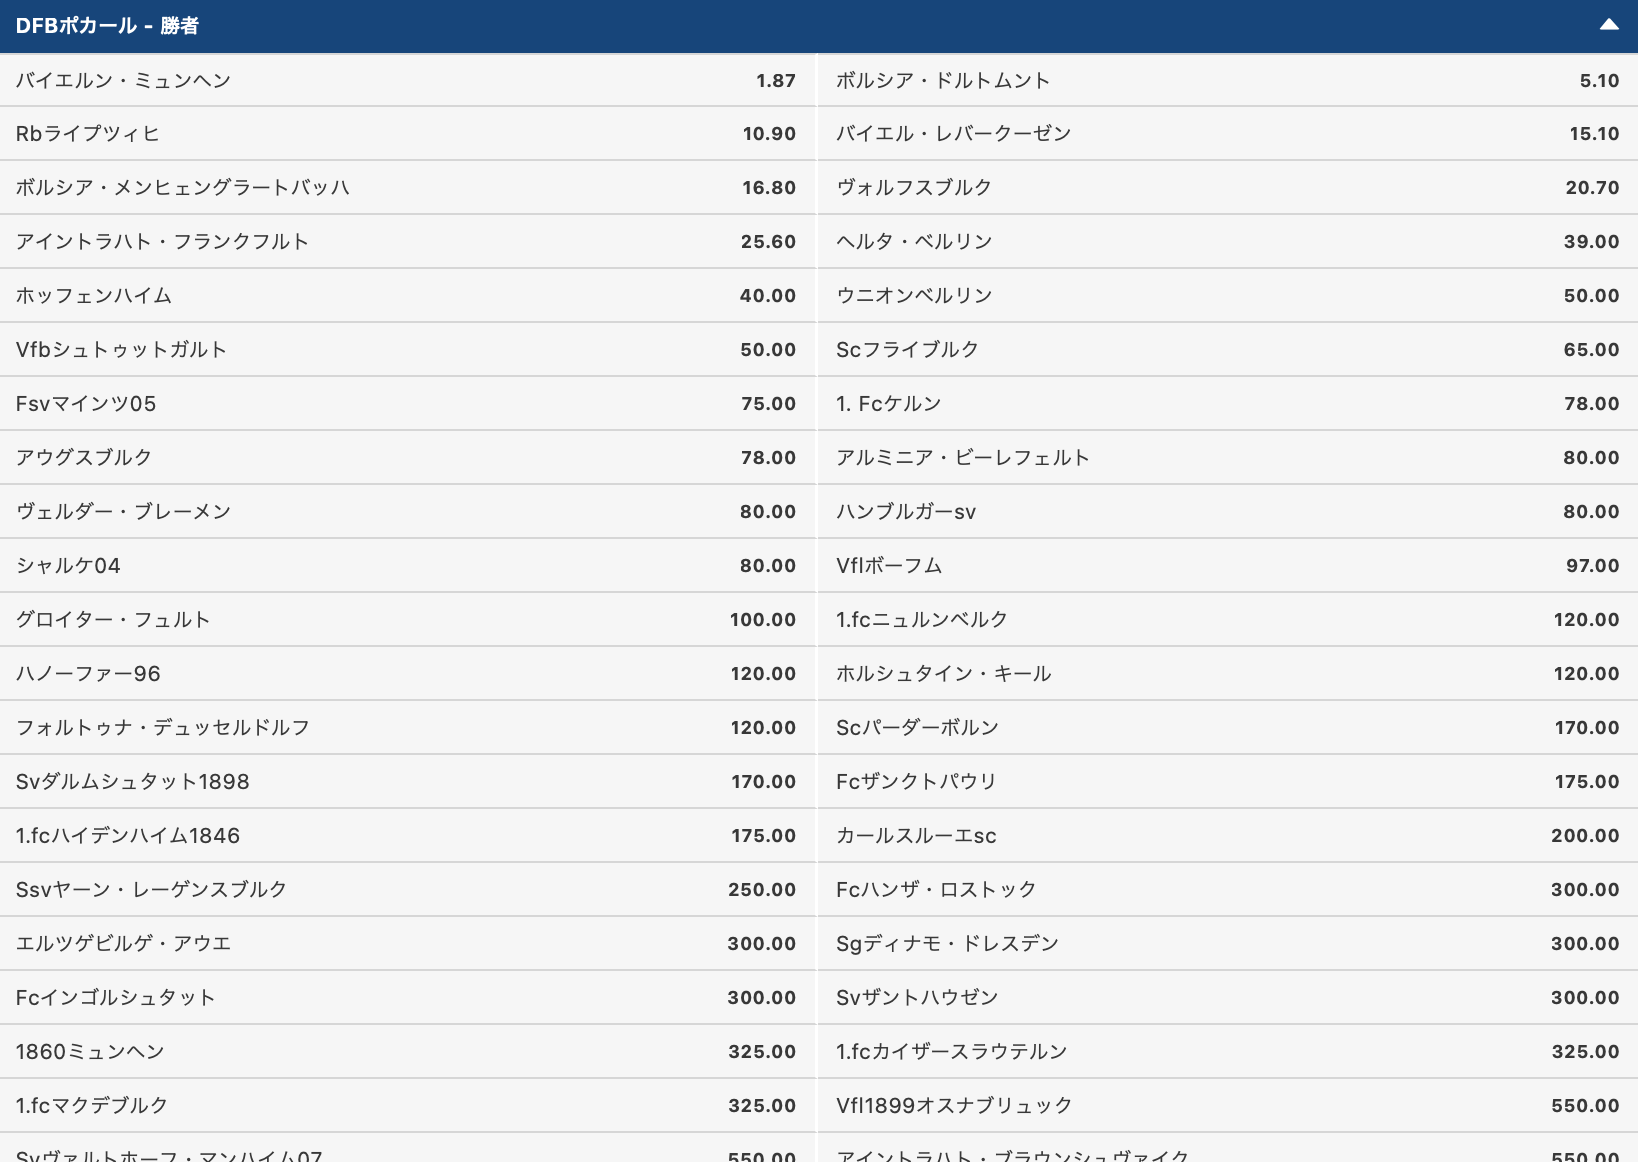 DFBポカール優勝予想オッズ2021-22シーズン/ドイツサッカーカップ戦